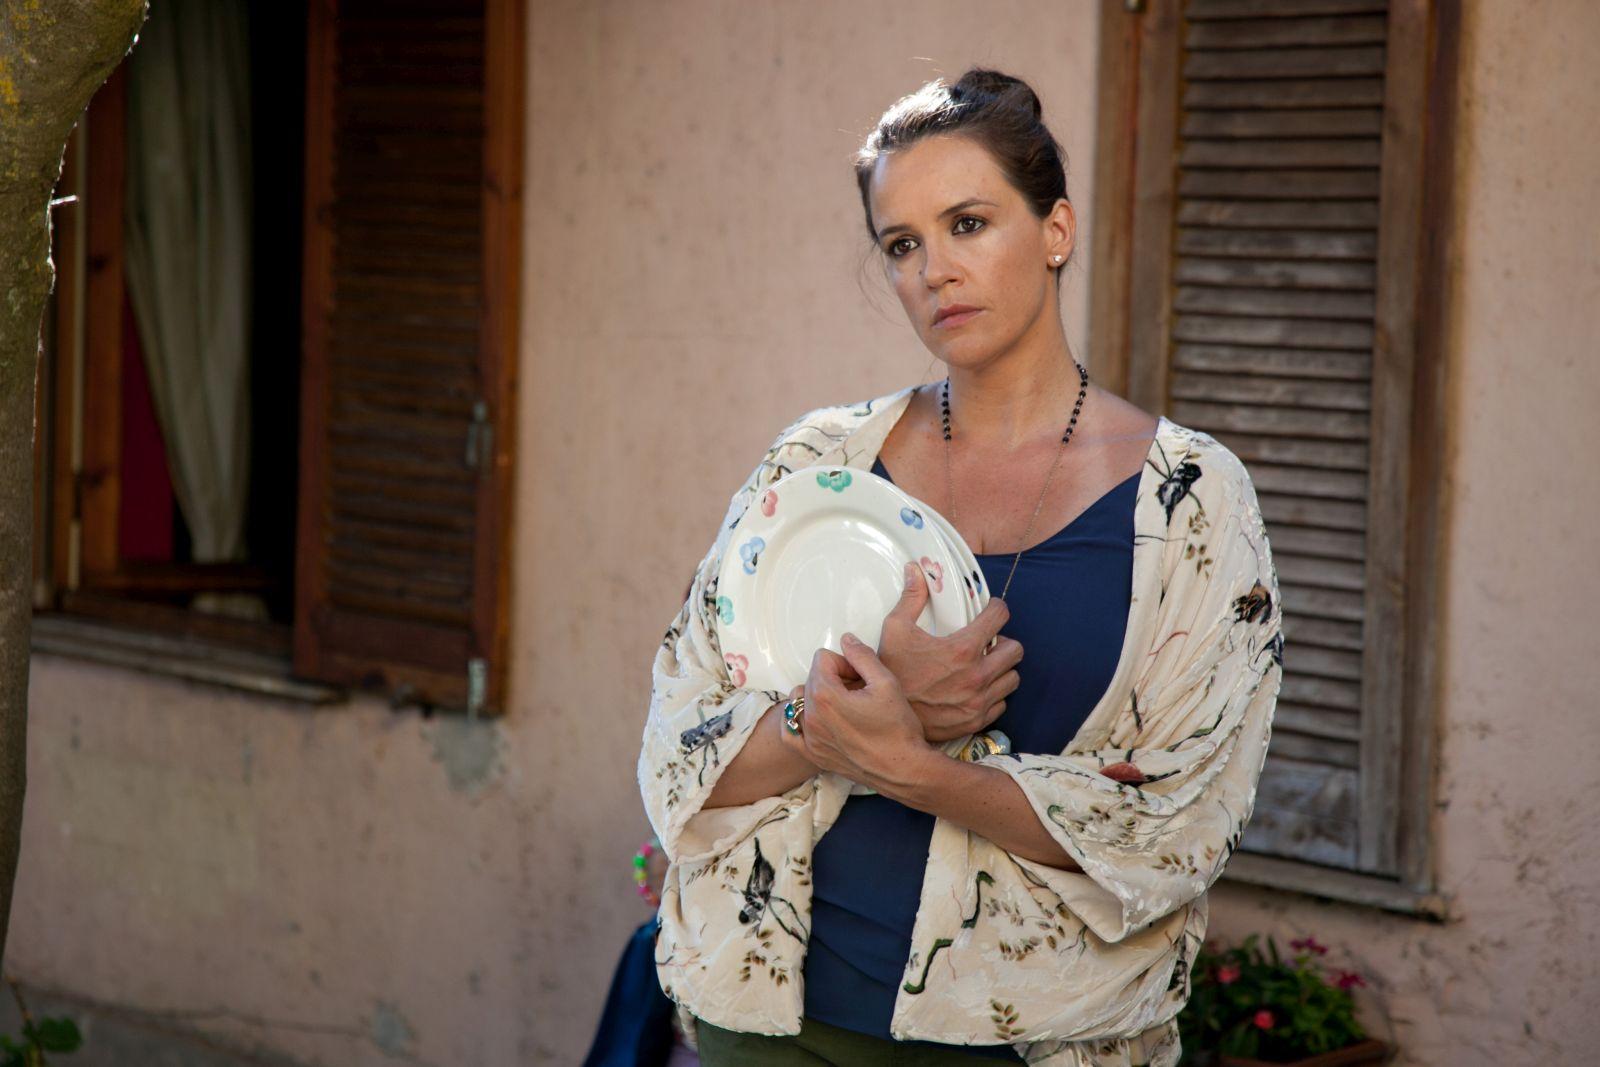 L'aquilone di Claudio: Irene Ferri in una scena del film